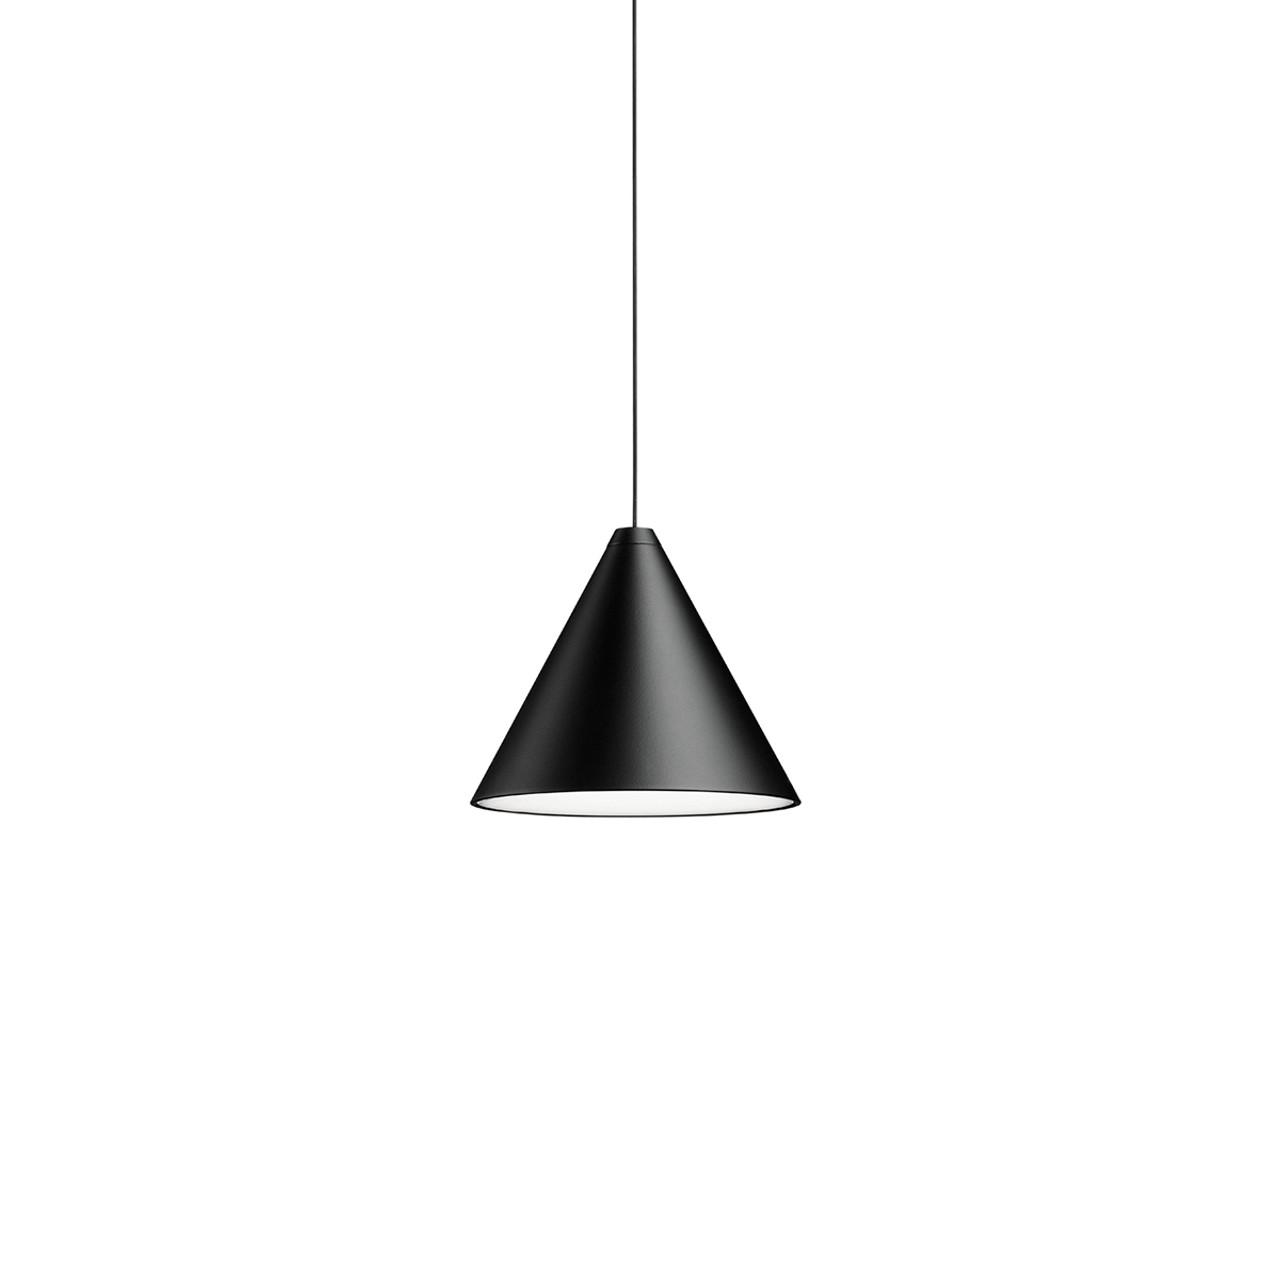 string lights cone michael anastassiades [ 1280 x 1280 Pixel ]